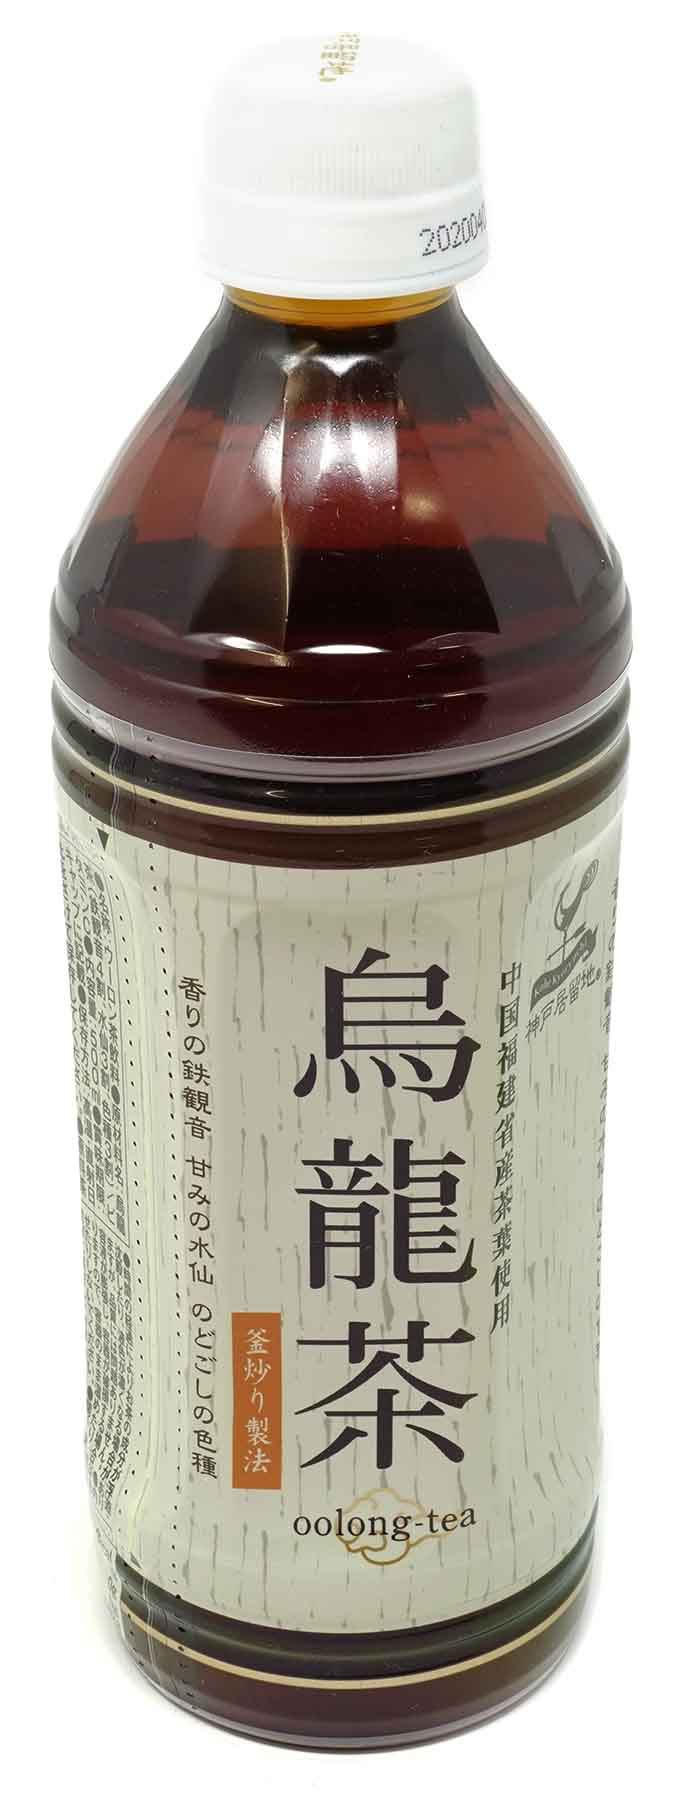 TOMINAGA Kobe Kyoryuchi Oolong Tee, 500 ml